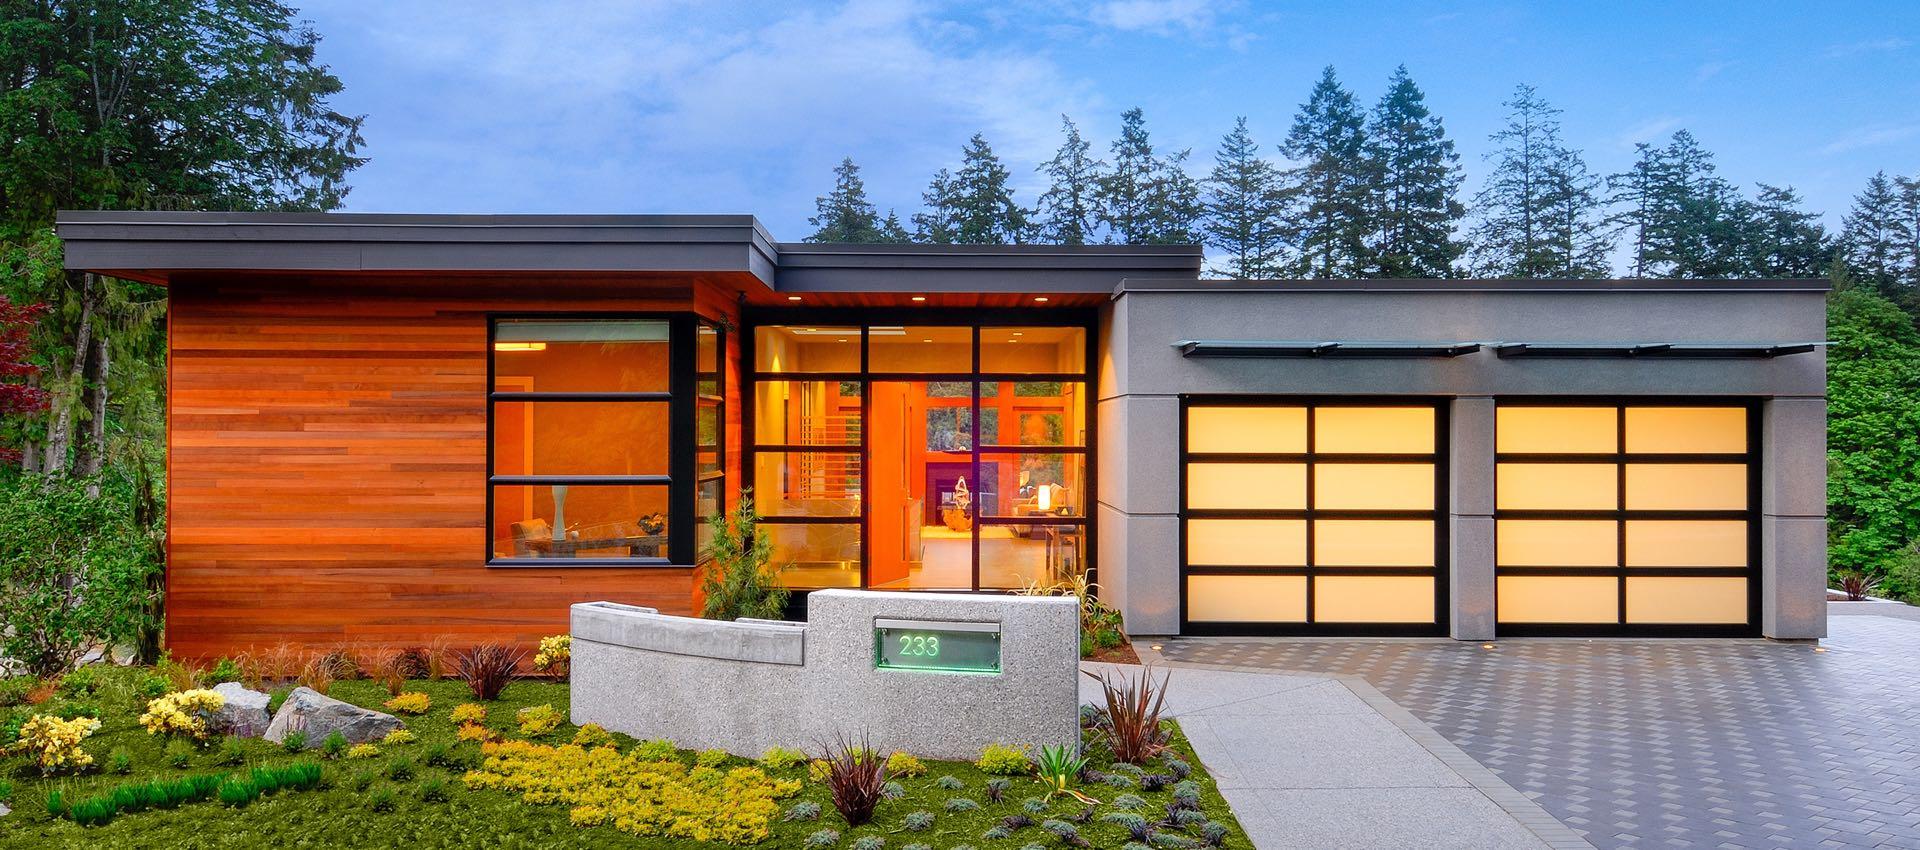 Christopher developments anya lane west coast for Custom home plans for sale